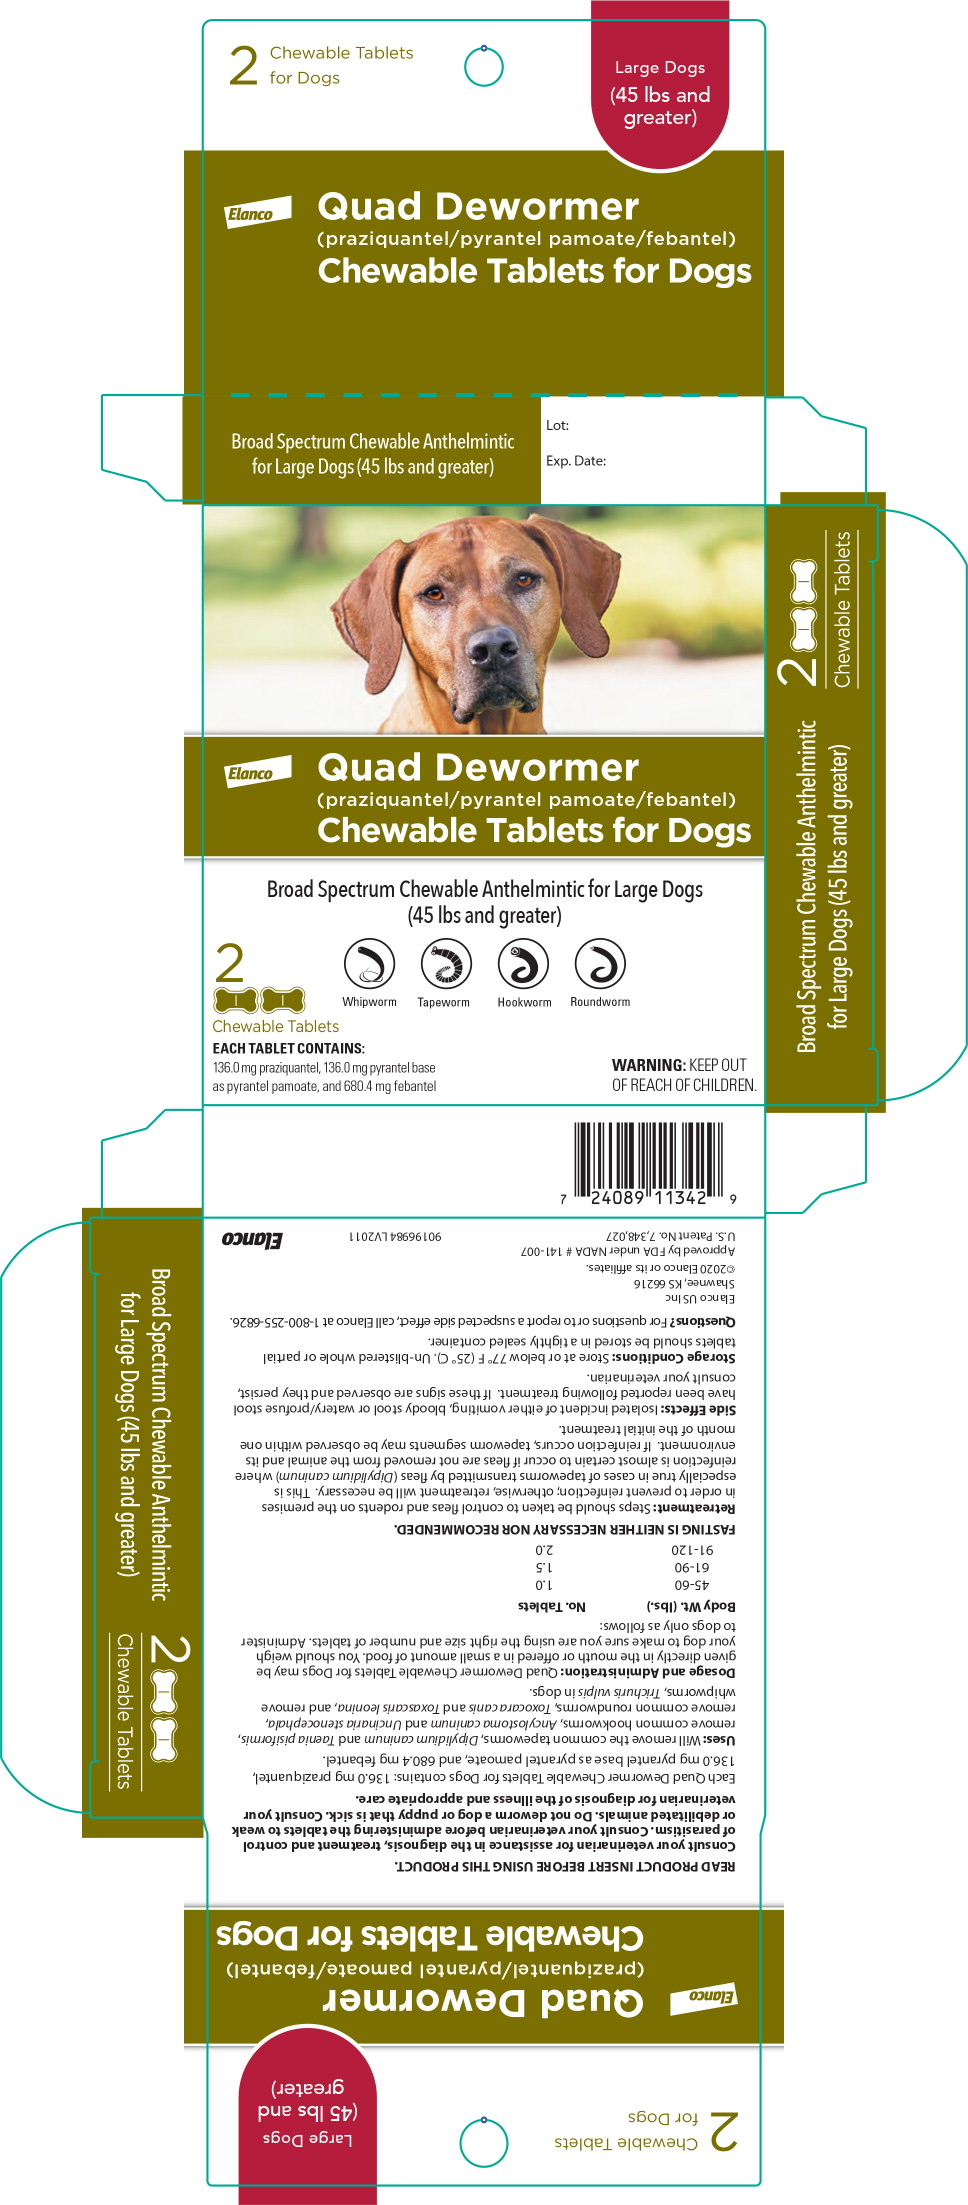 Principal Display Panel – Large Dogs Carton Label